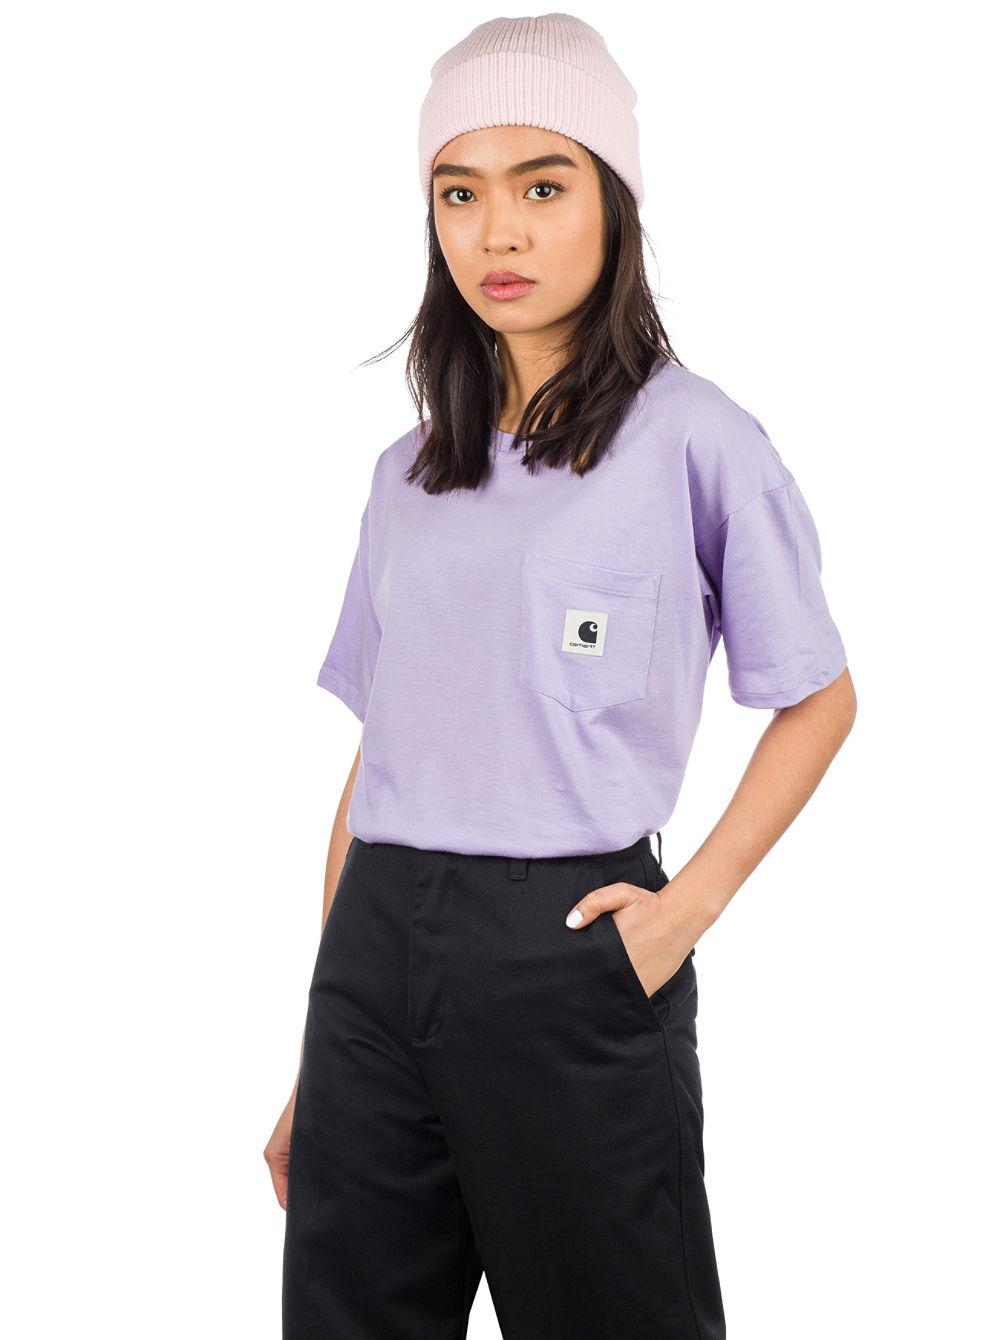 664375f746d Compra Carhartt WIP Carrie Pocket Camiseta en línea en Blue Tomato